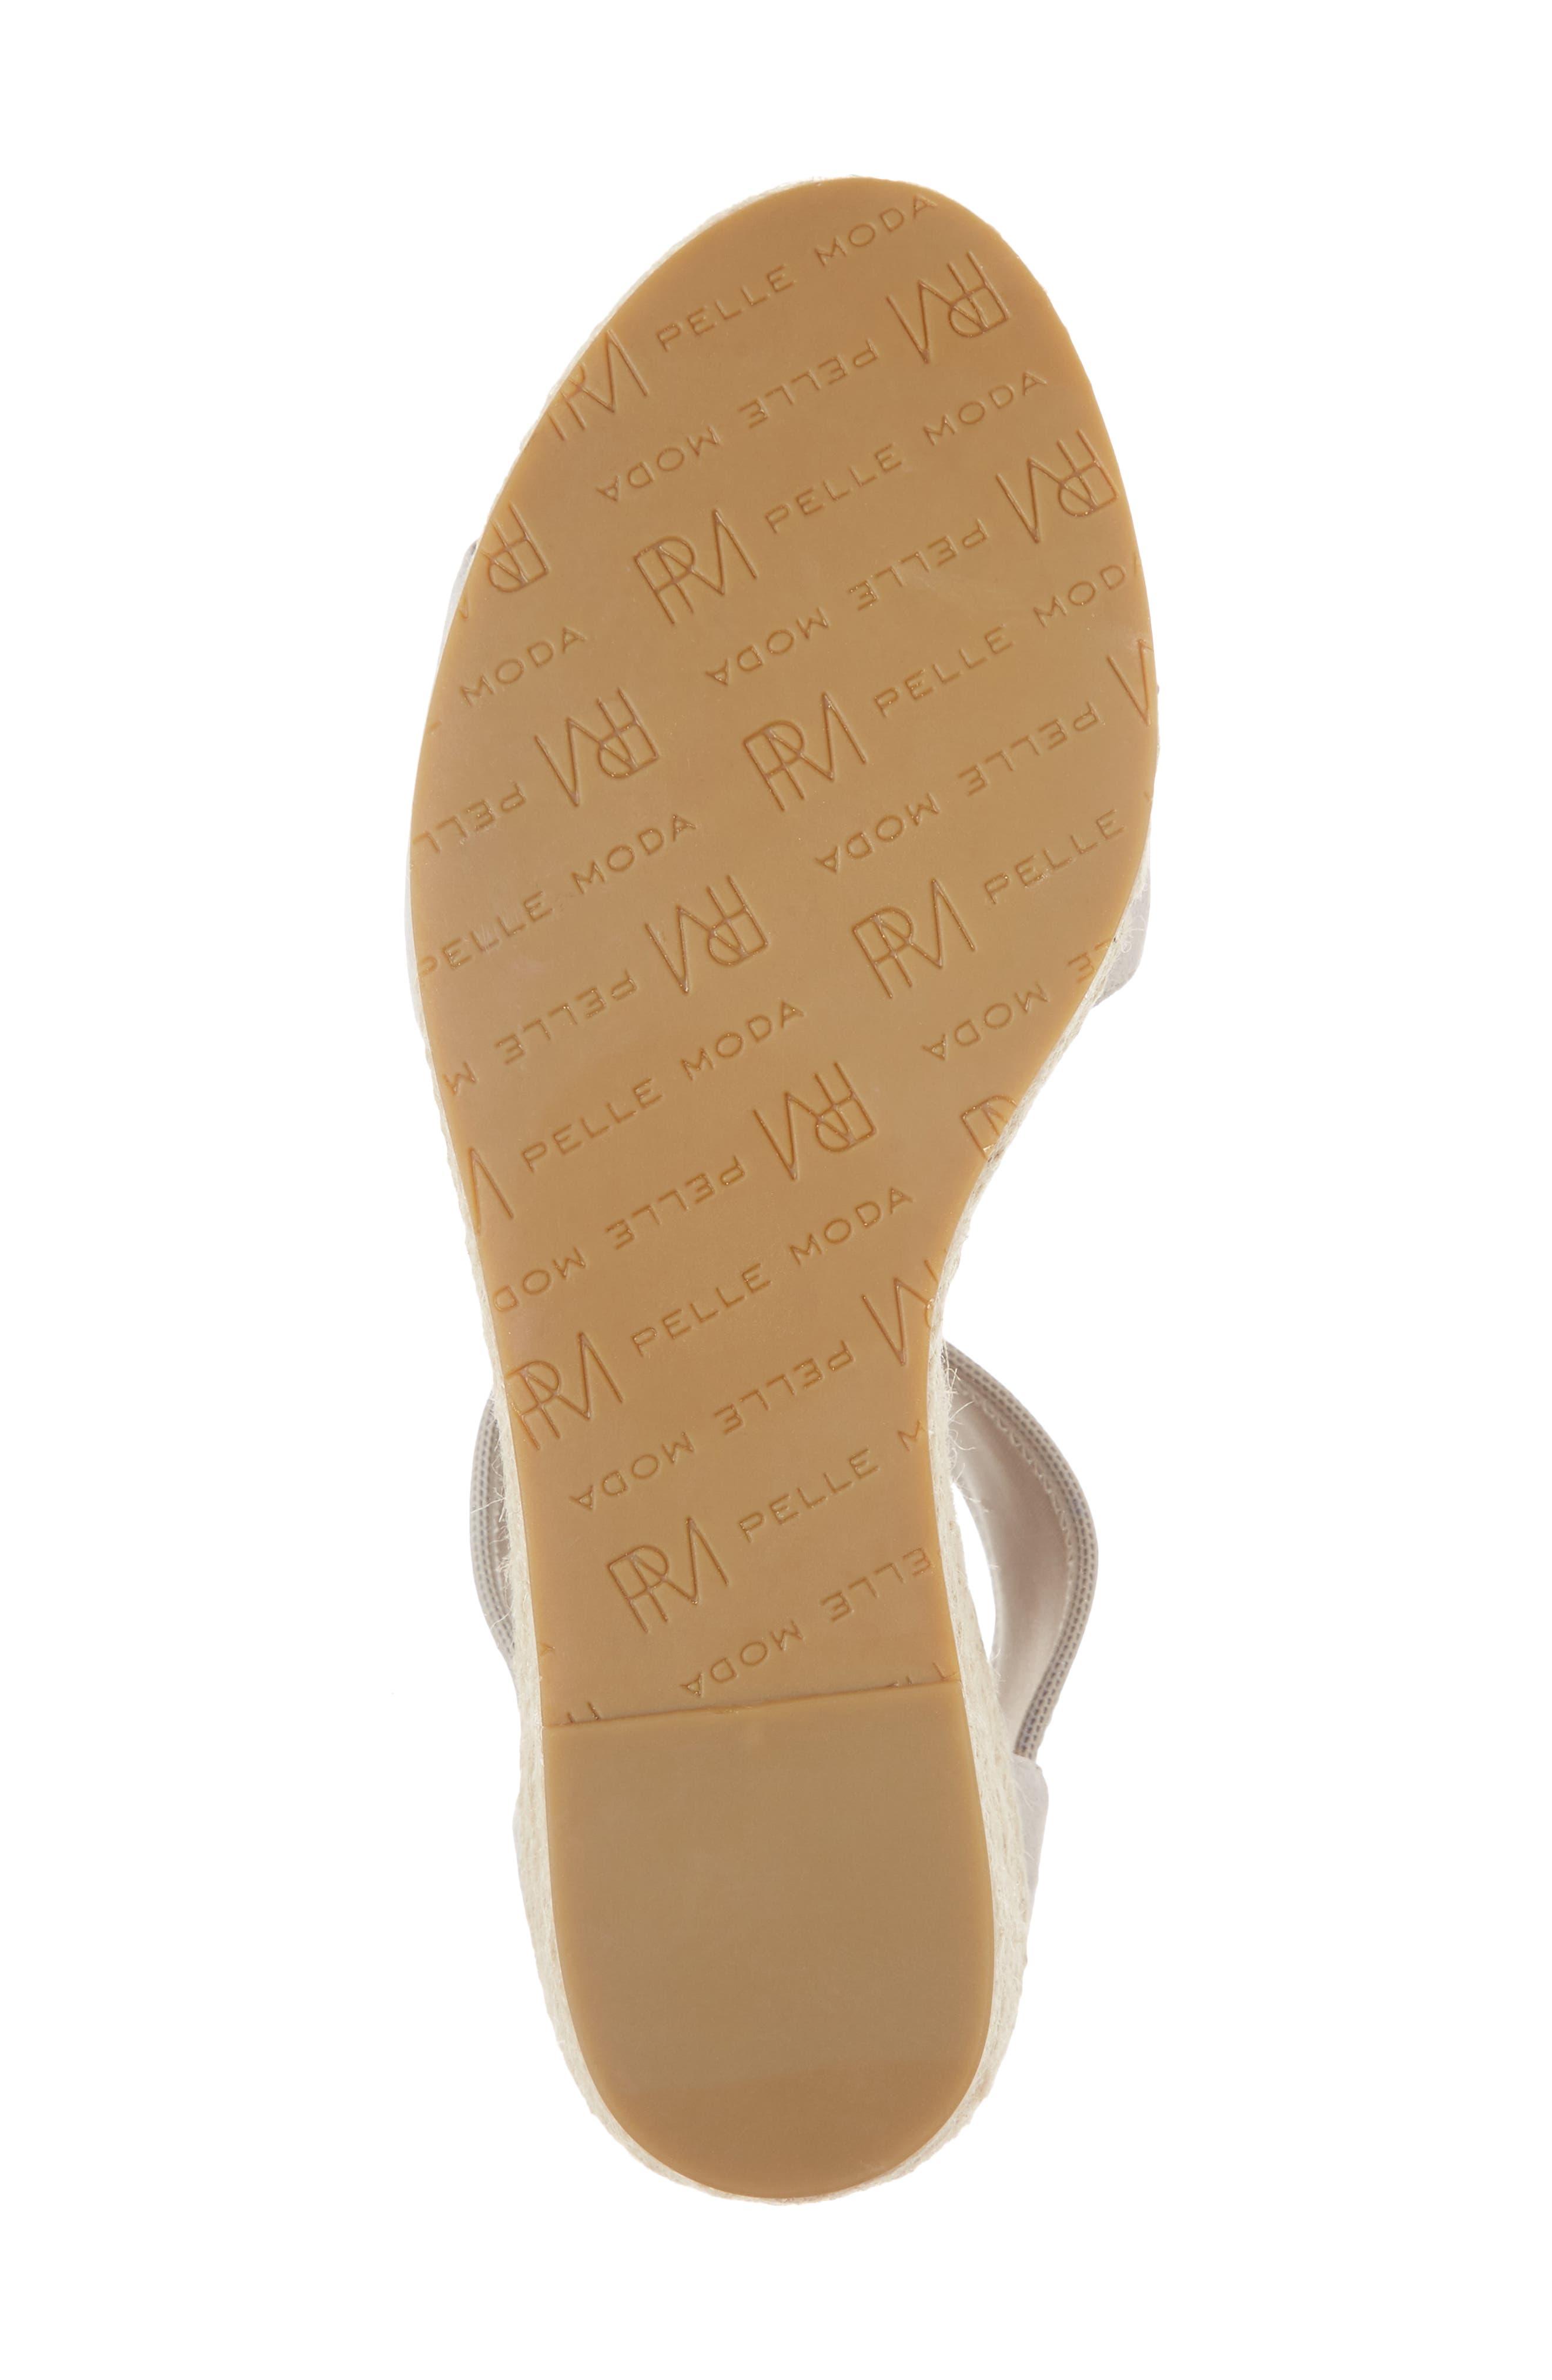 Kona Platform Wedge Sandal,                             Alternate thumbnail 6, color,                             CLOUD SUEDE